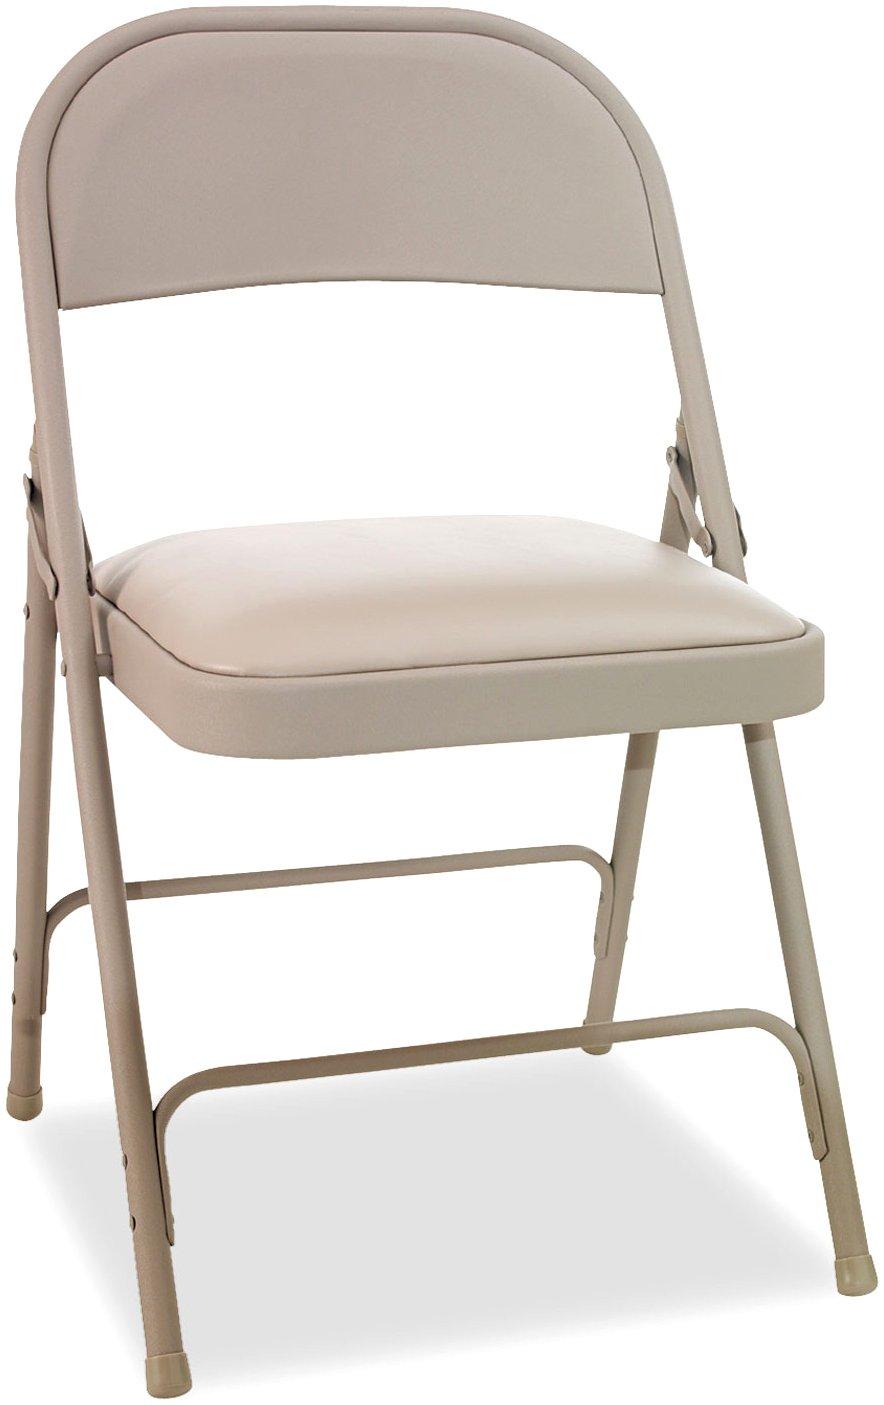 Sensational Alera Heavy Duty Padded Folding Chair Office Chairs For Machost Co Dining Chair Design Ideas Machostcouk